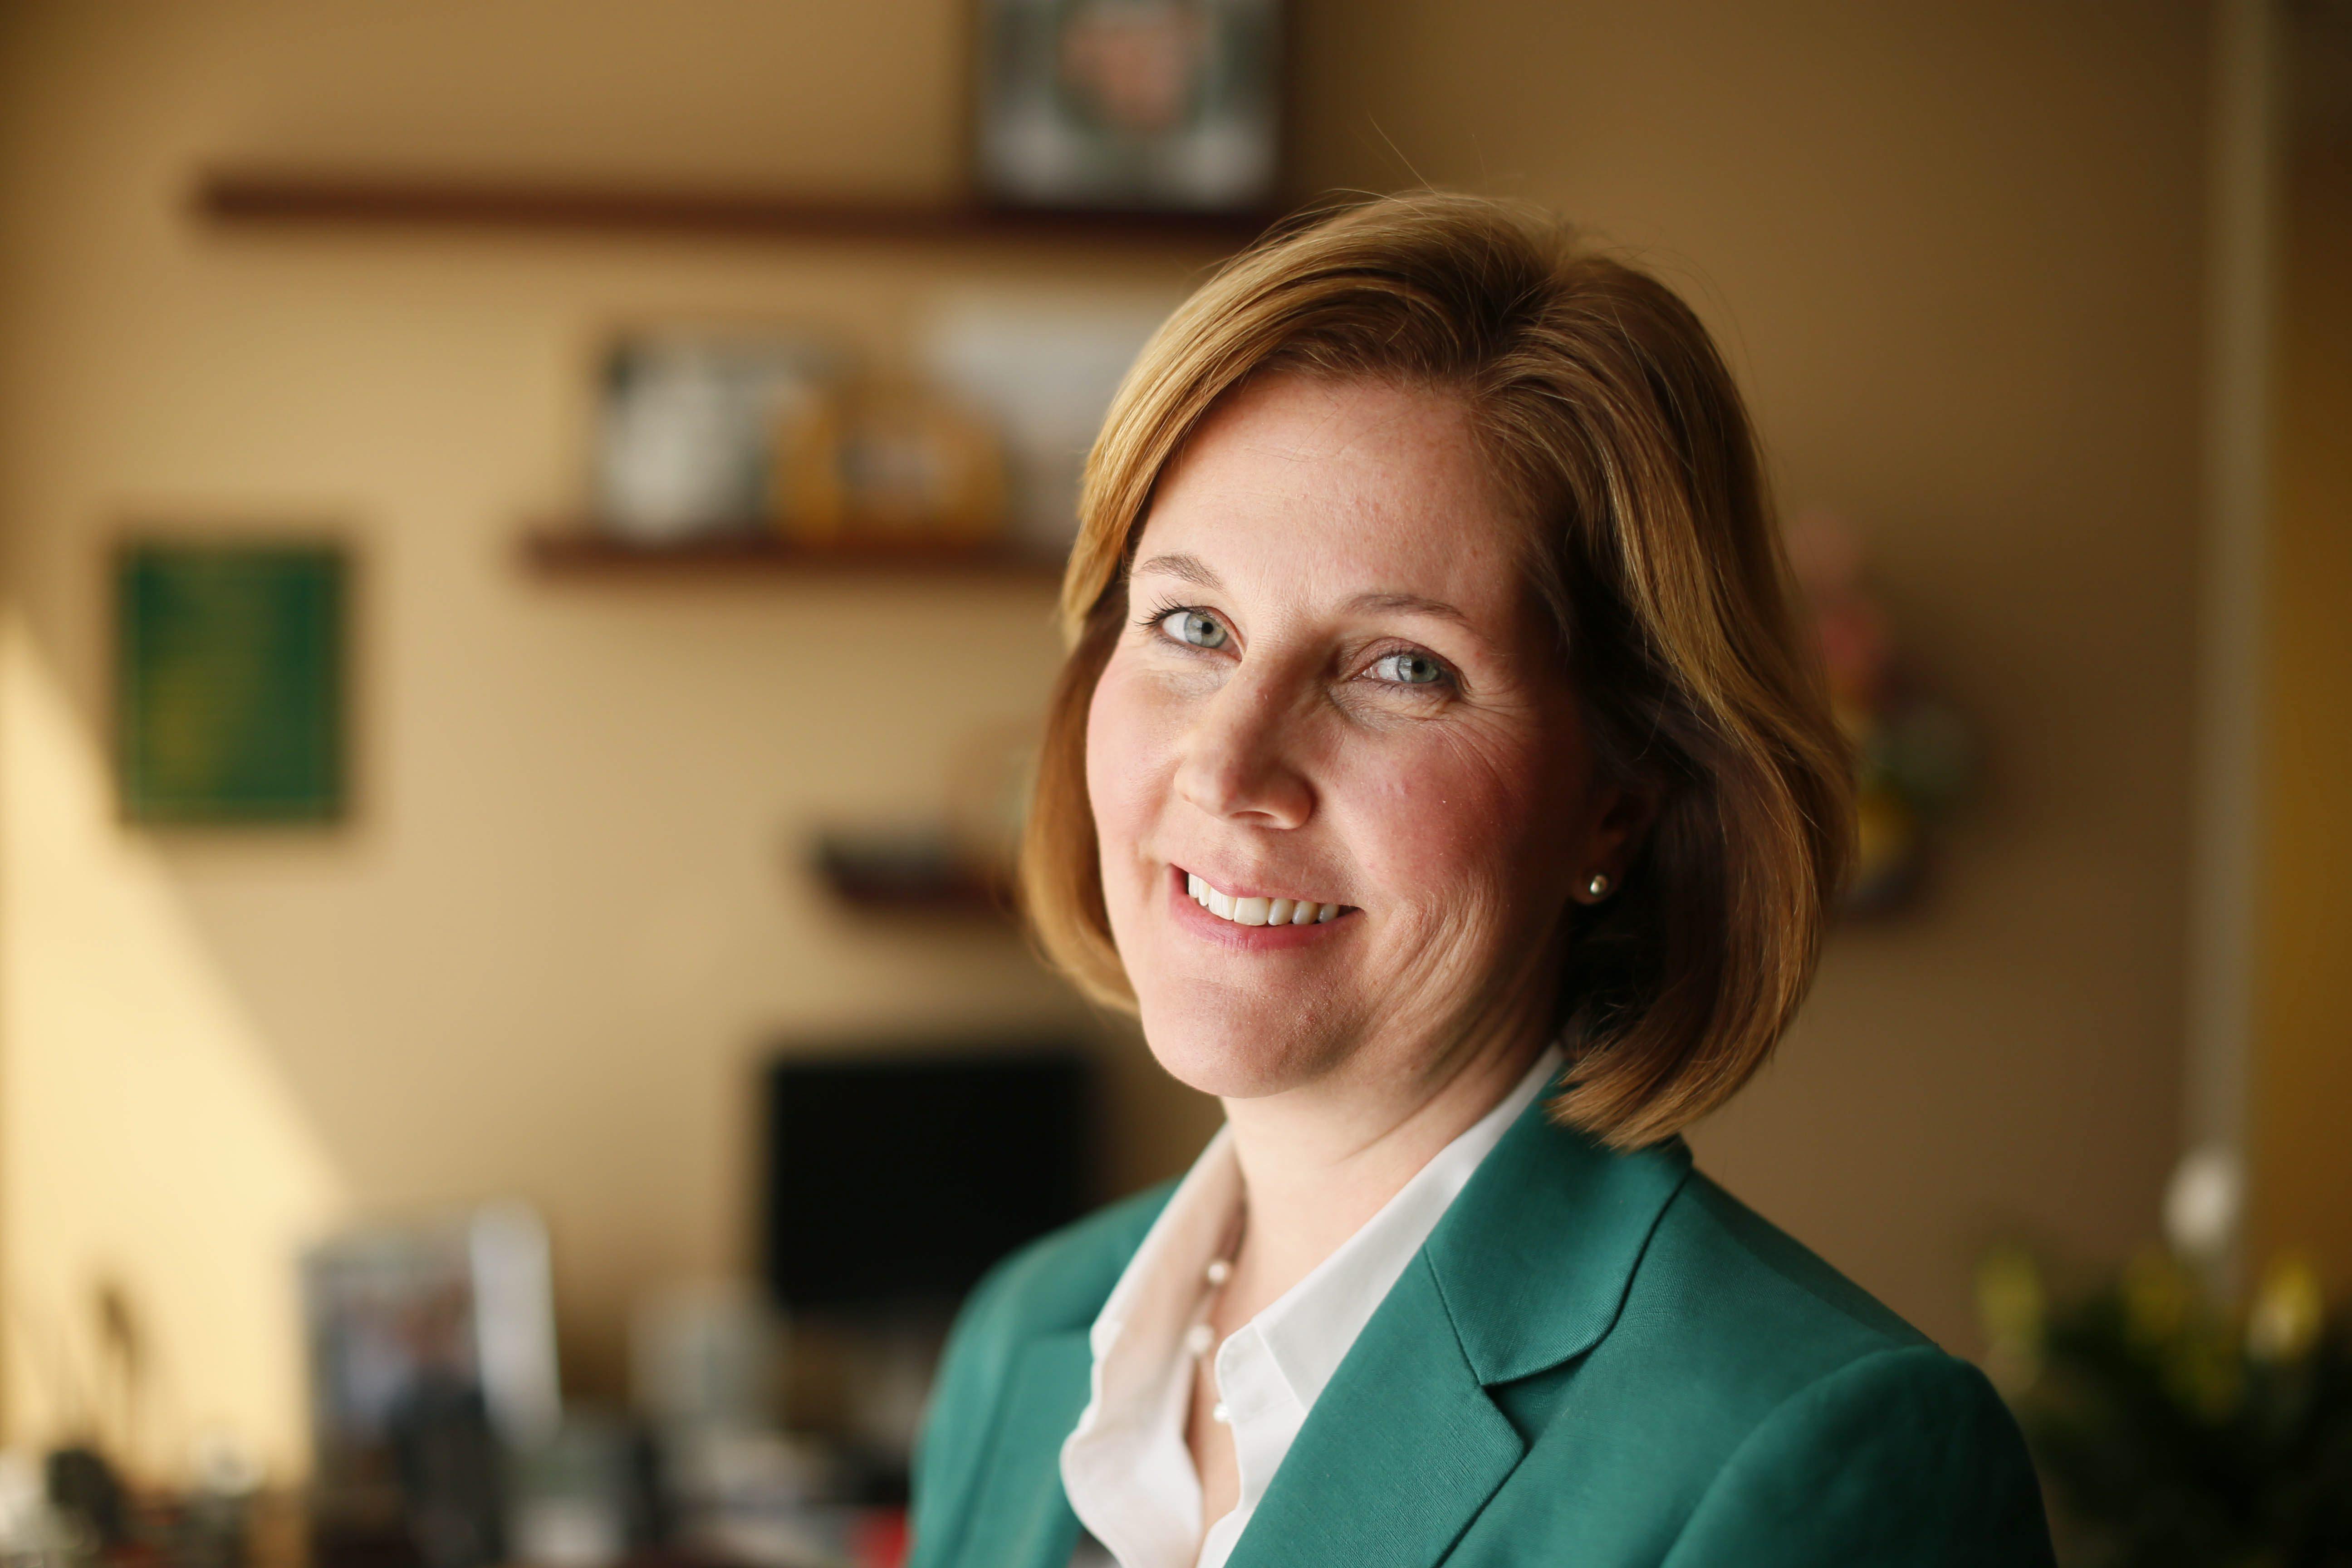 McCaffrey resigns as Lockport mayor to become CEO of Eastern Niagara ...